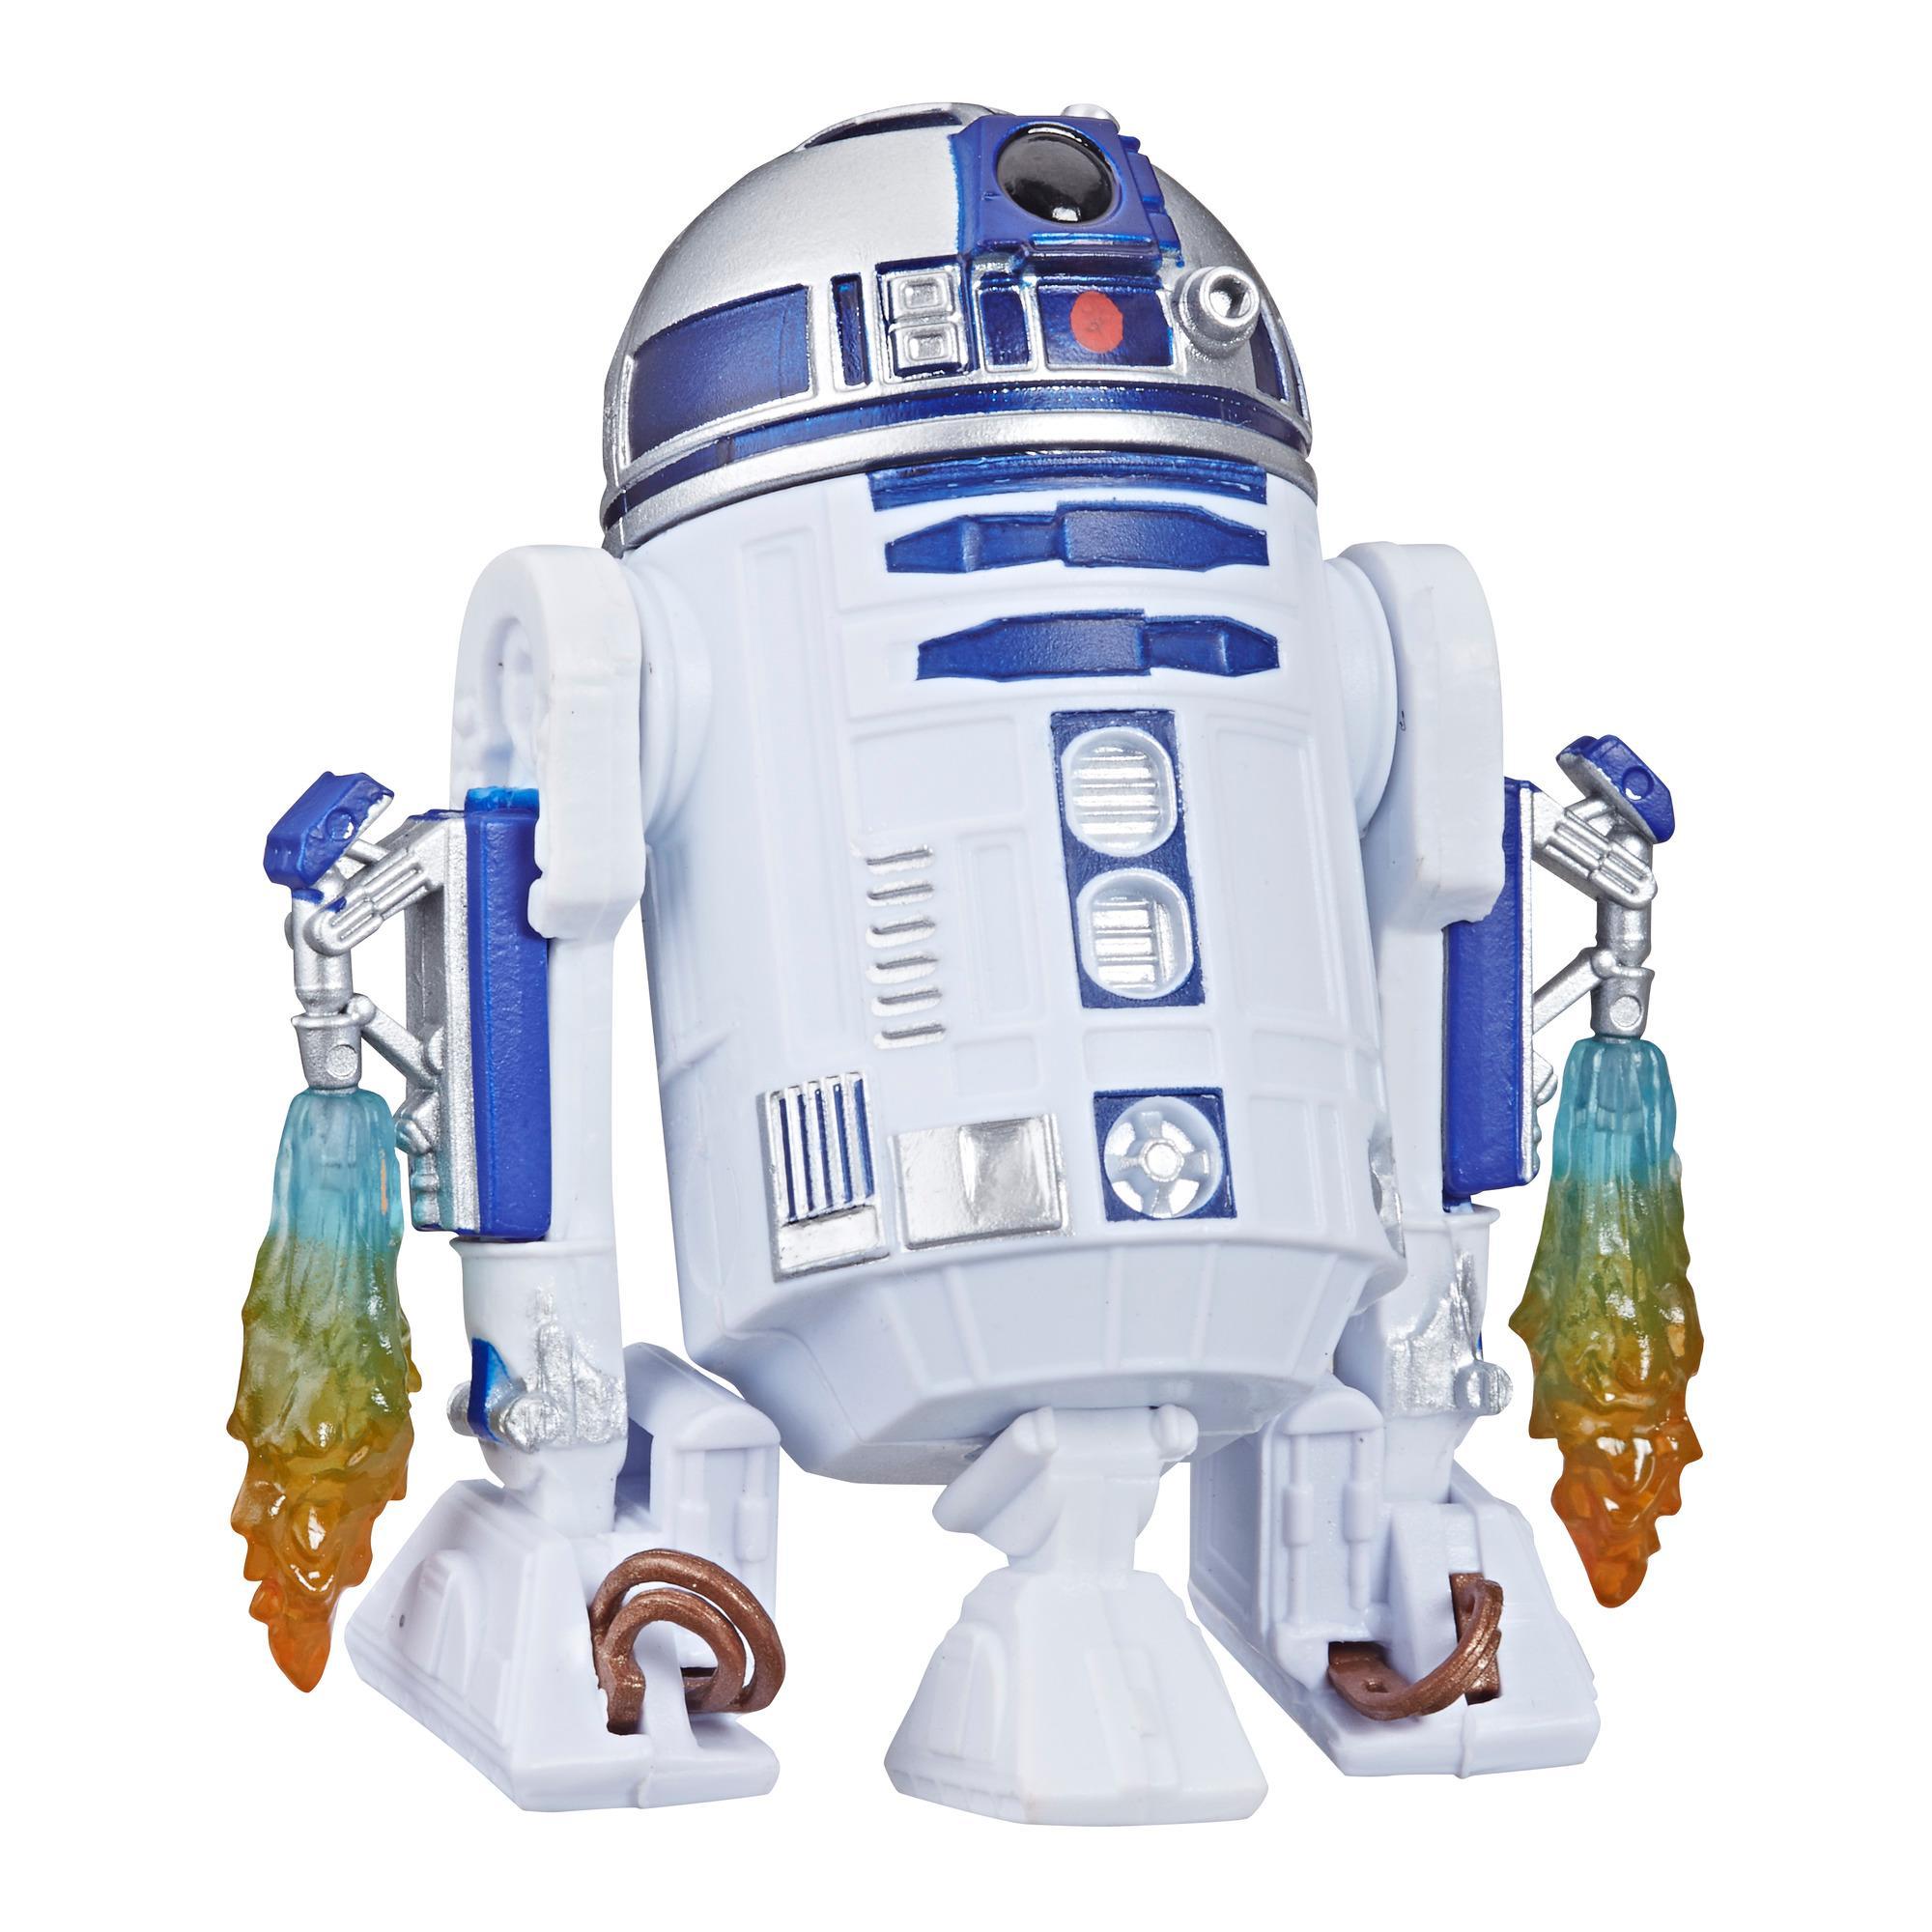 Star Wars Galaxy of Adventures R2-D2 Figur